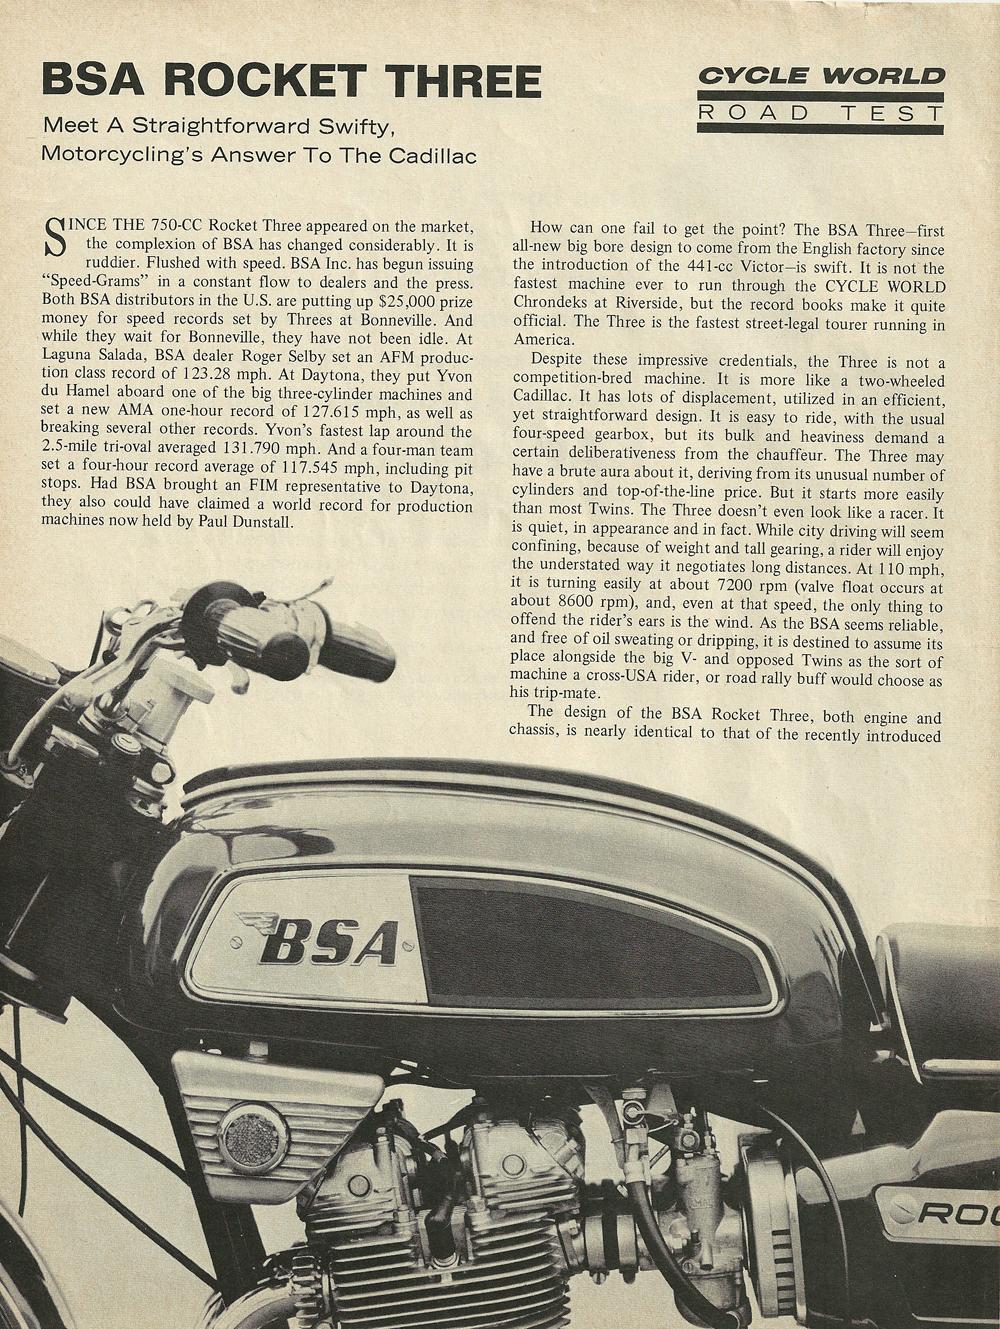 1969 BSA Rocket 3 road test 1.jpg